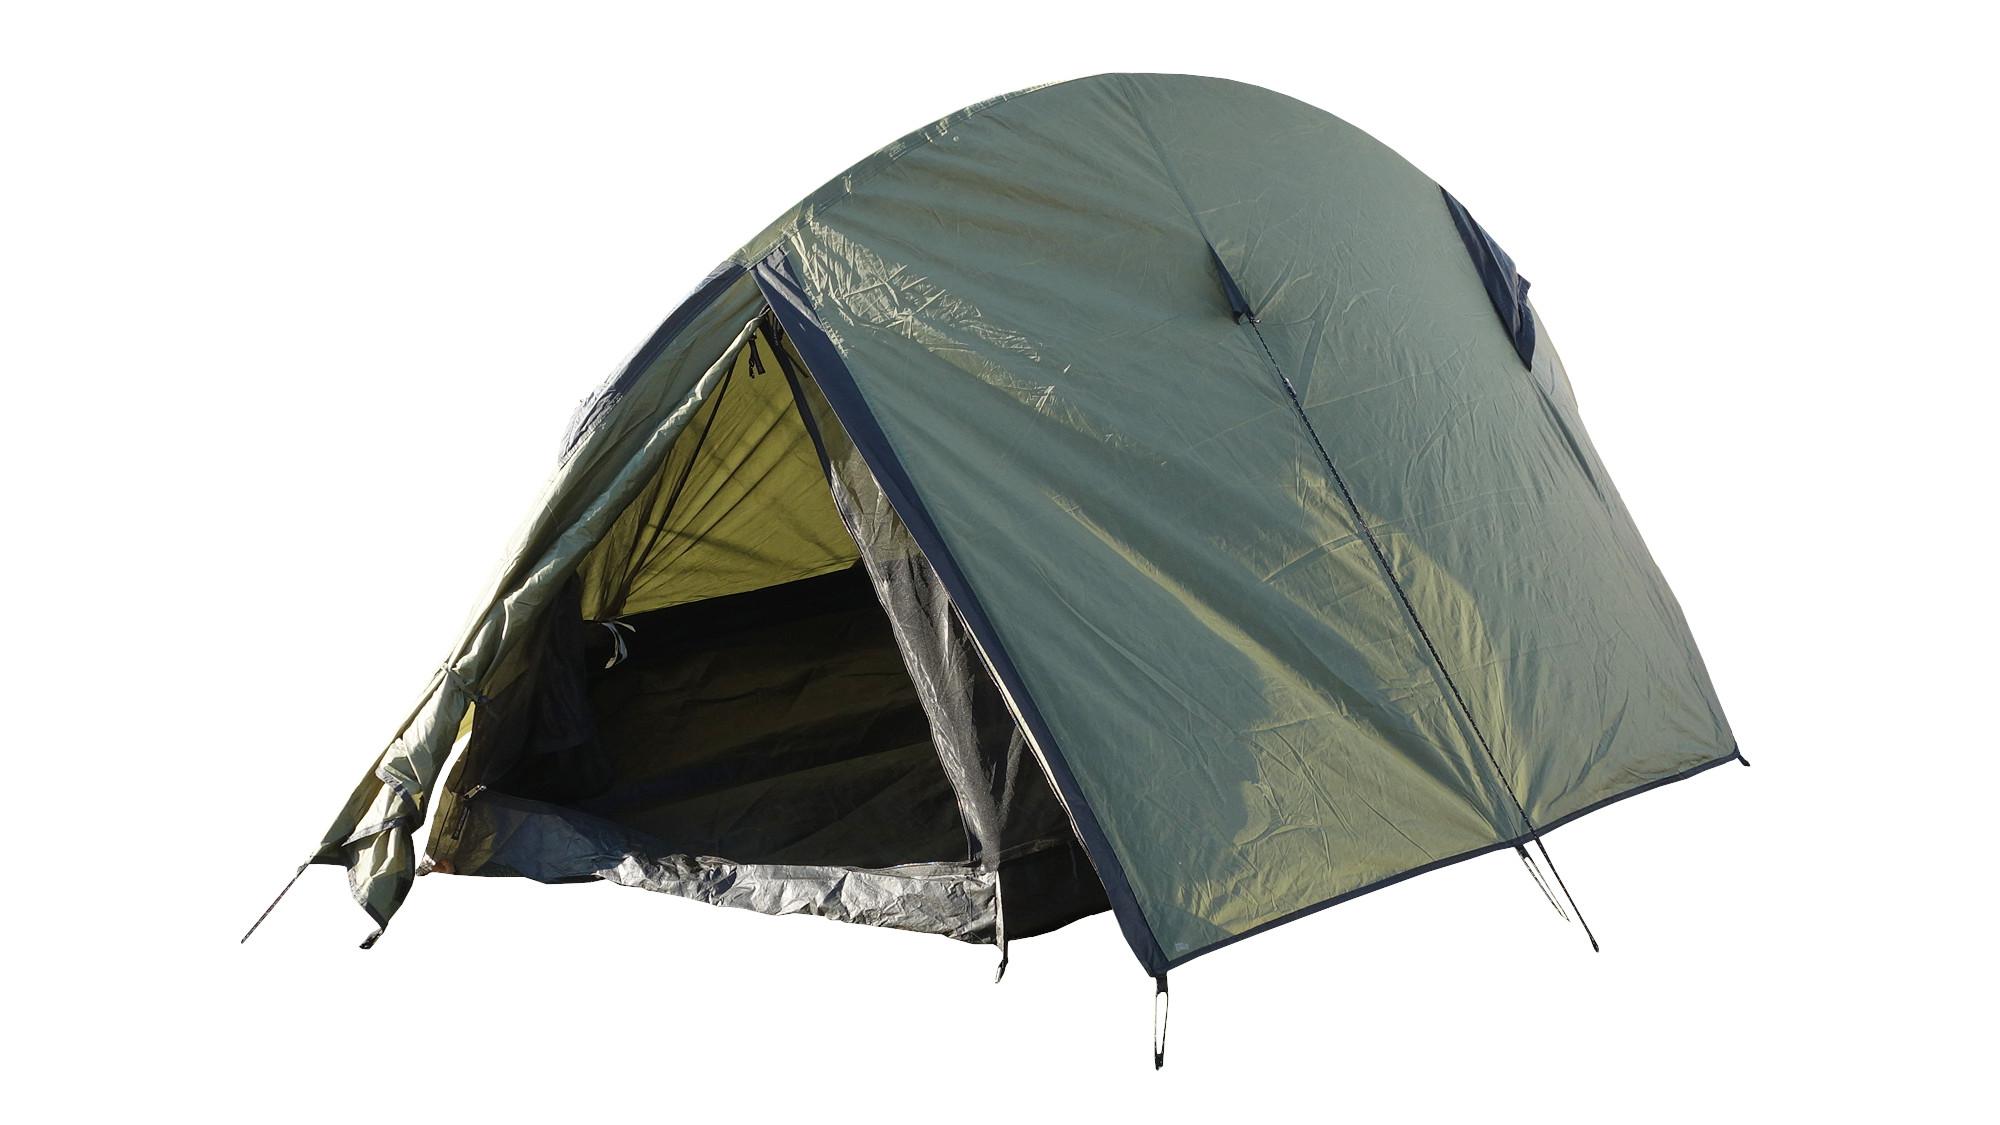 2-Personen Zelt leihen